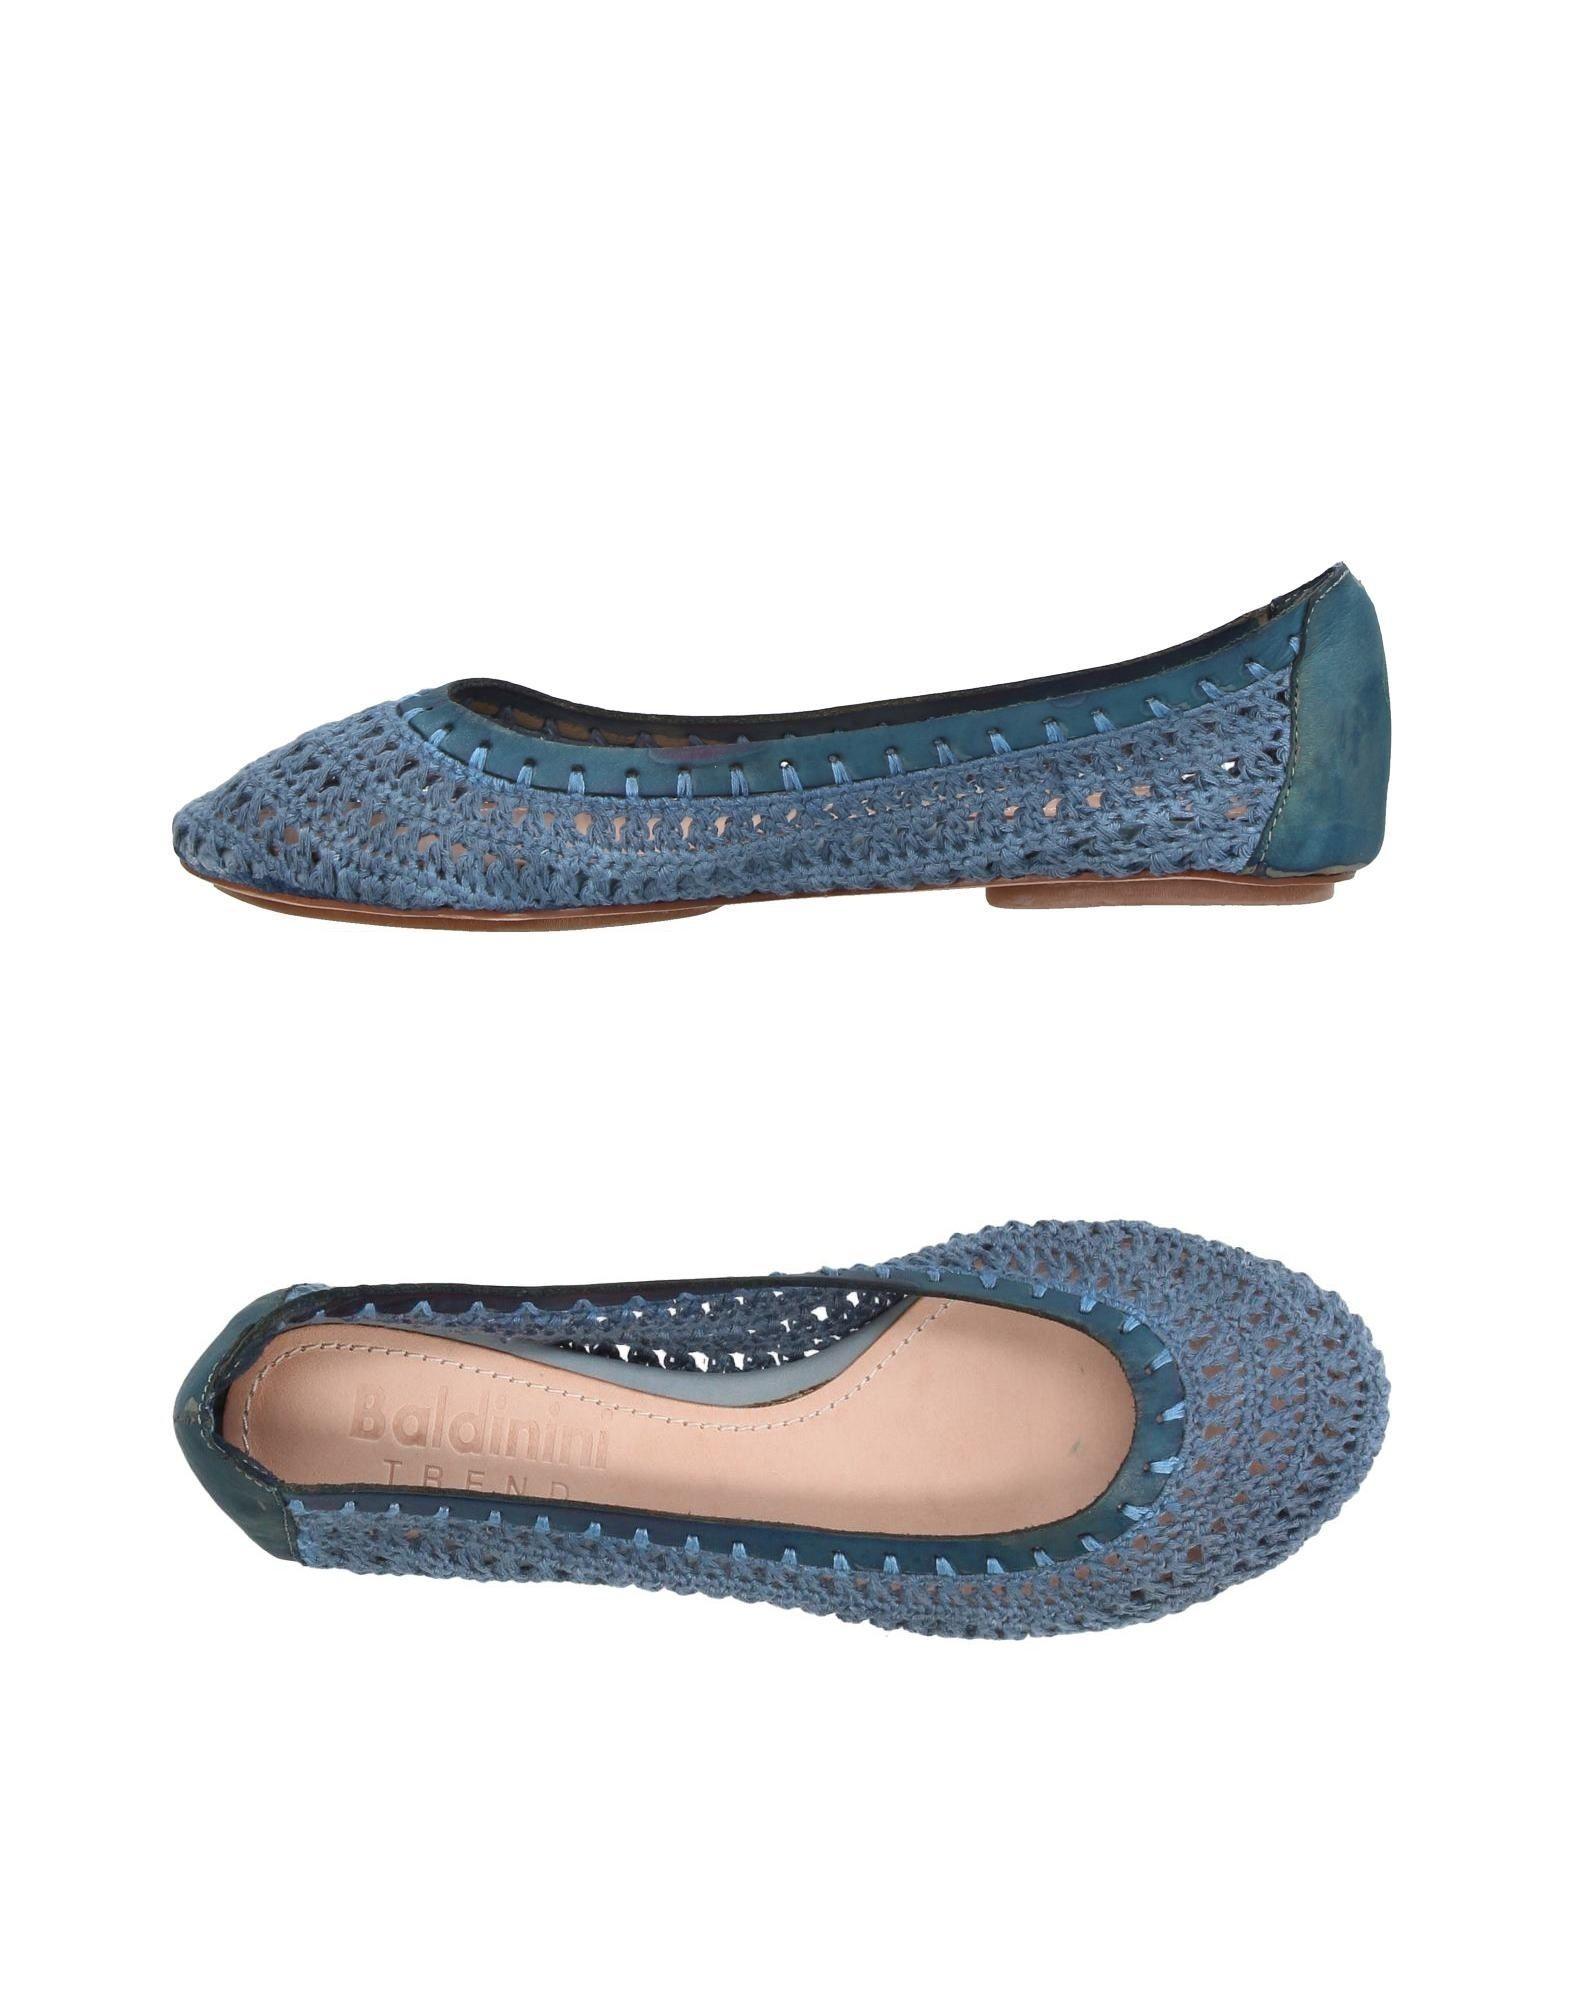 Baldinini Trend Ballerinas Damen  11407212TC Gute Qualität beliebte Schuhe